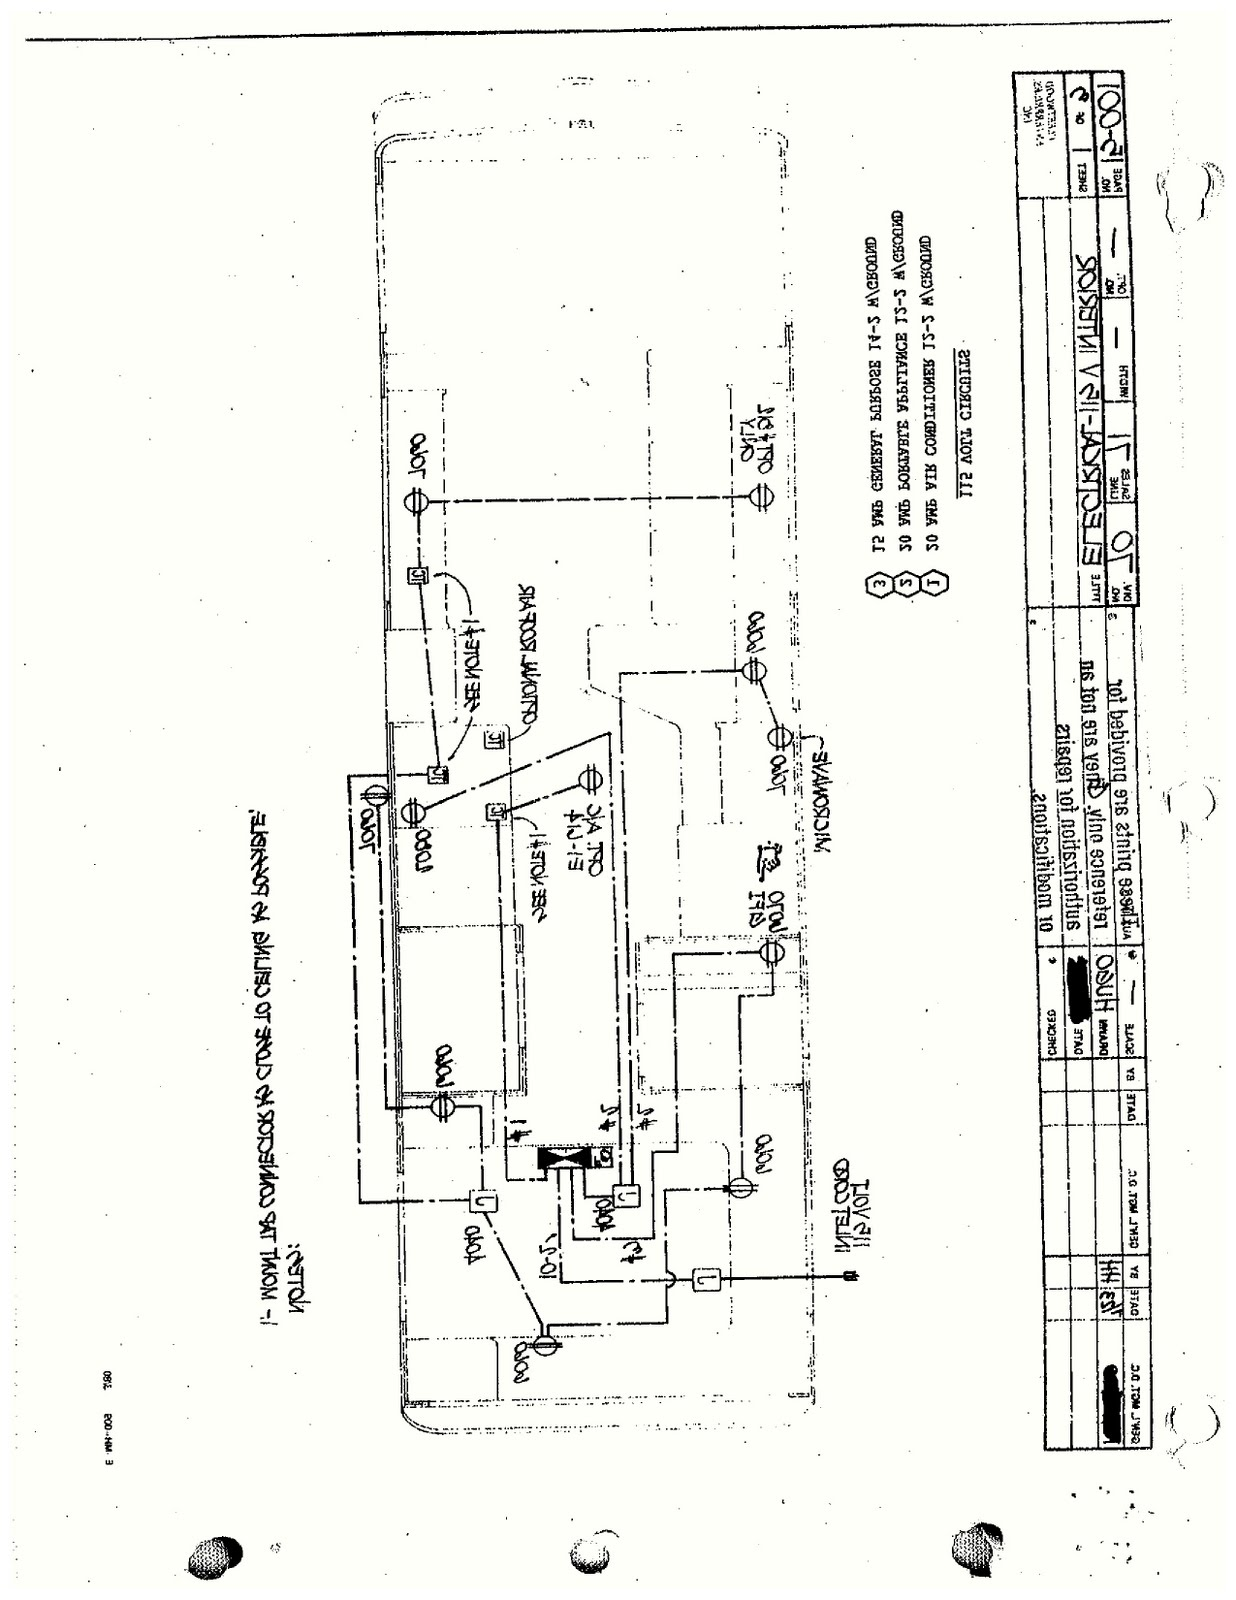 Chevy S10 Wiring Diagram Dlc